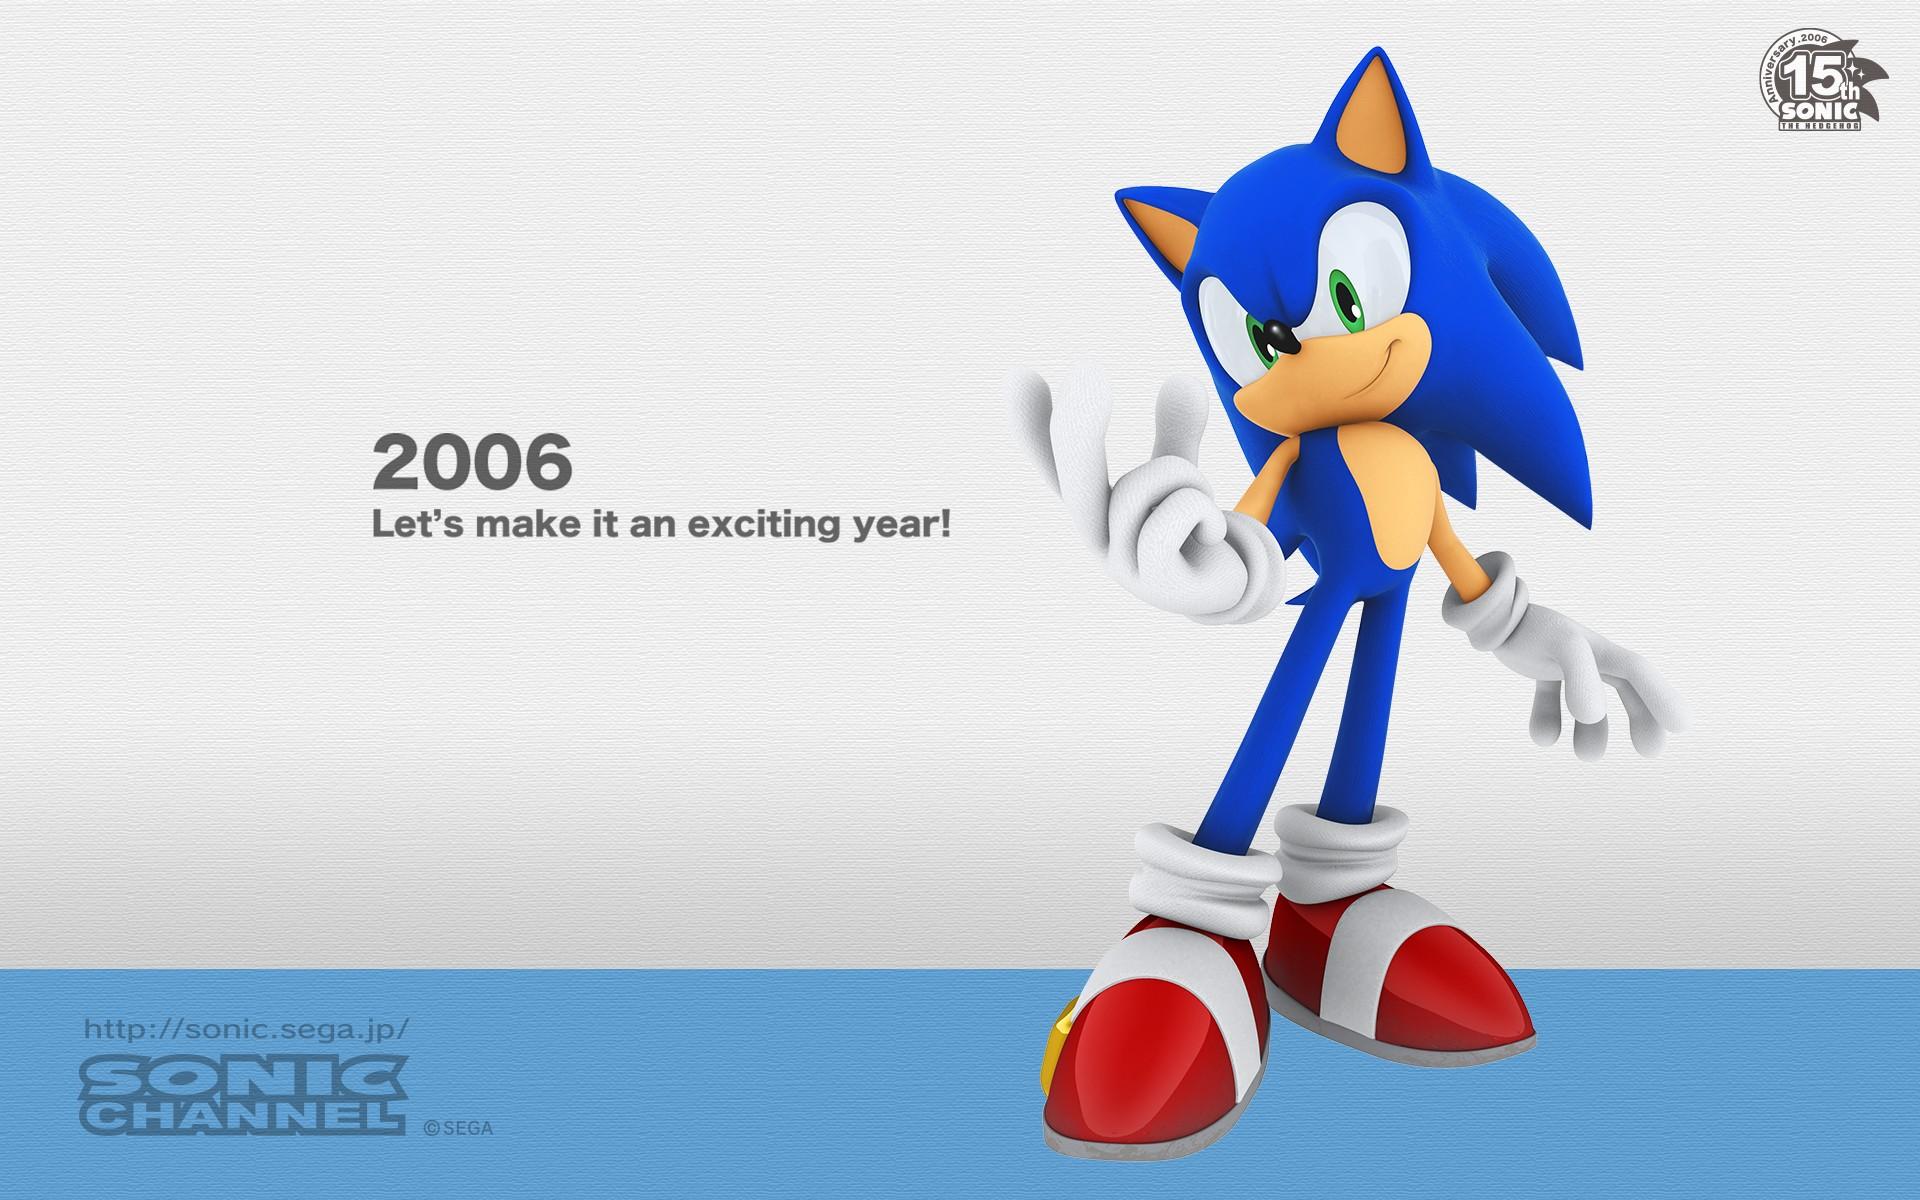 Wallpaper 1920x1200 Px Sega Sonic The Hedgehog 1920x1200